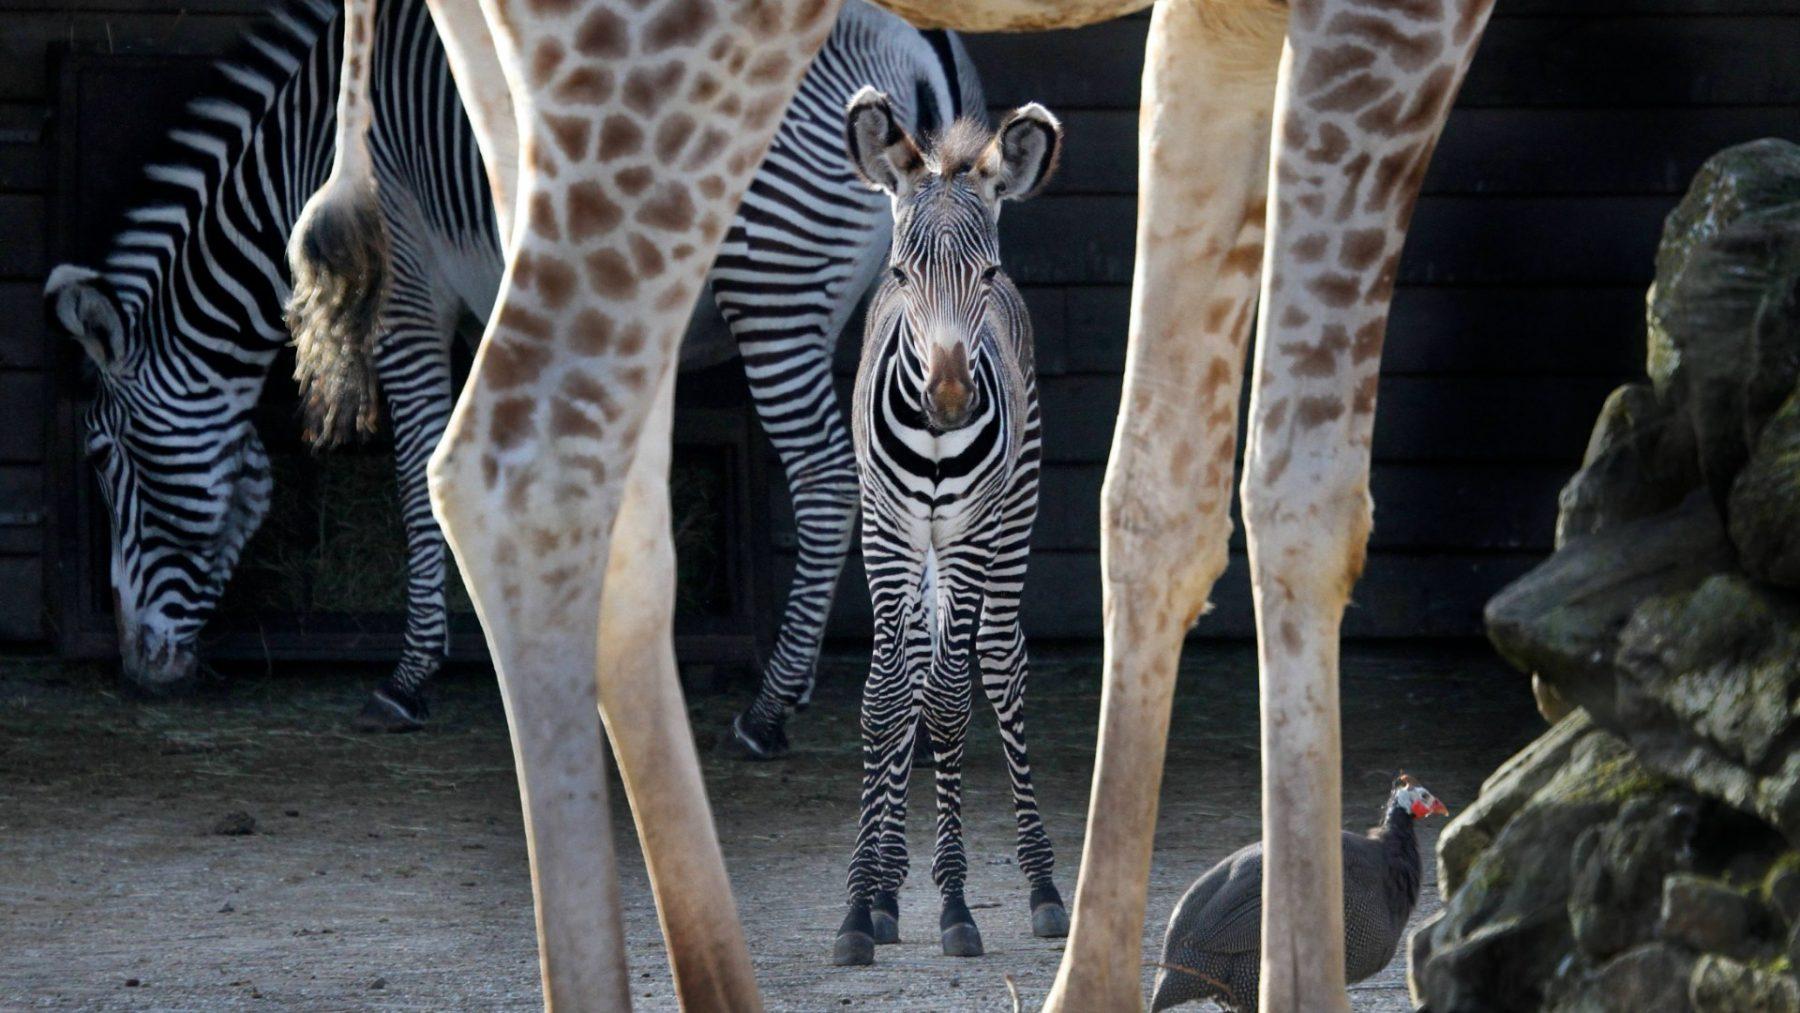 Dierentuin ARTIS apetrots op pasgeboren Grévy-zebra